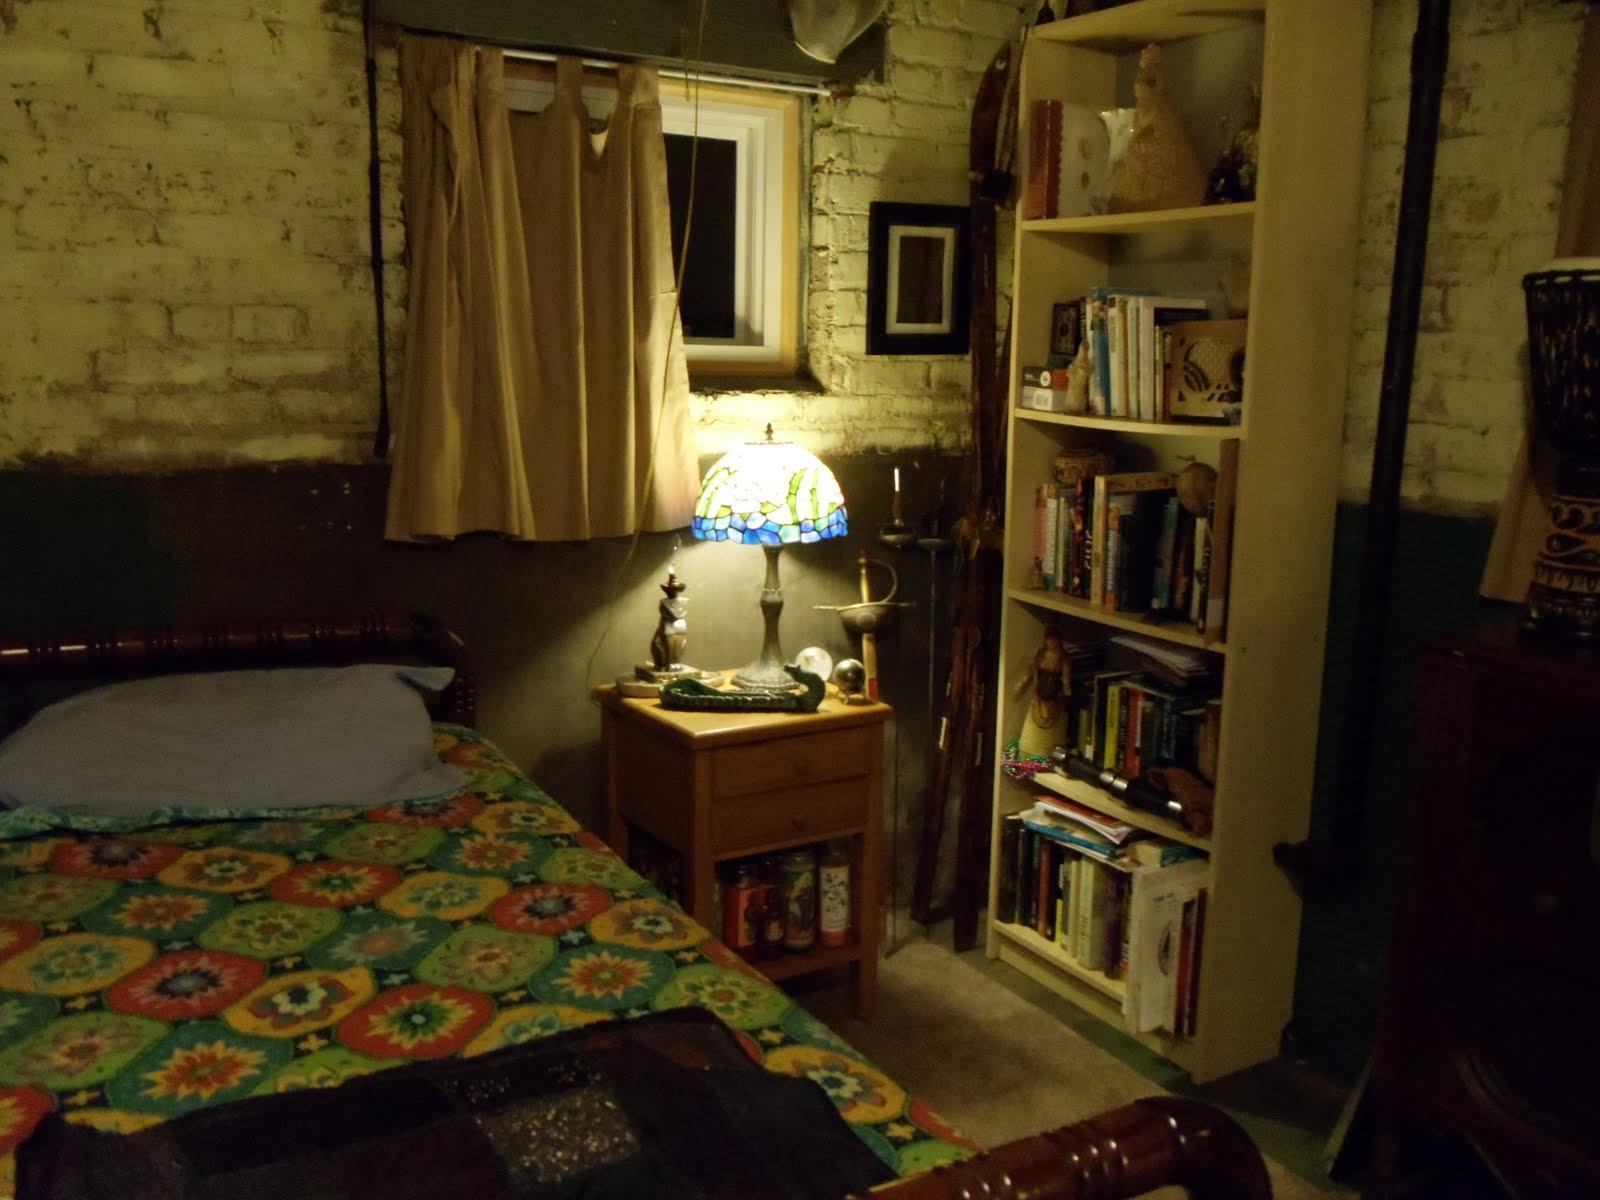 The Box House Basement fice By Night